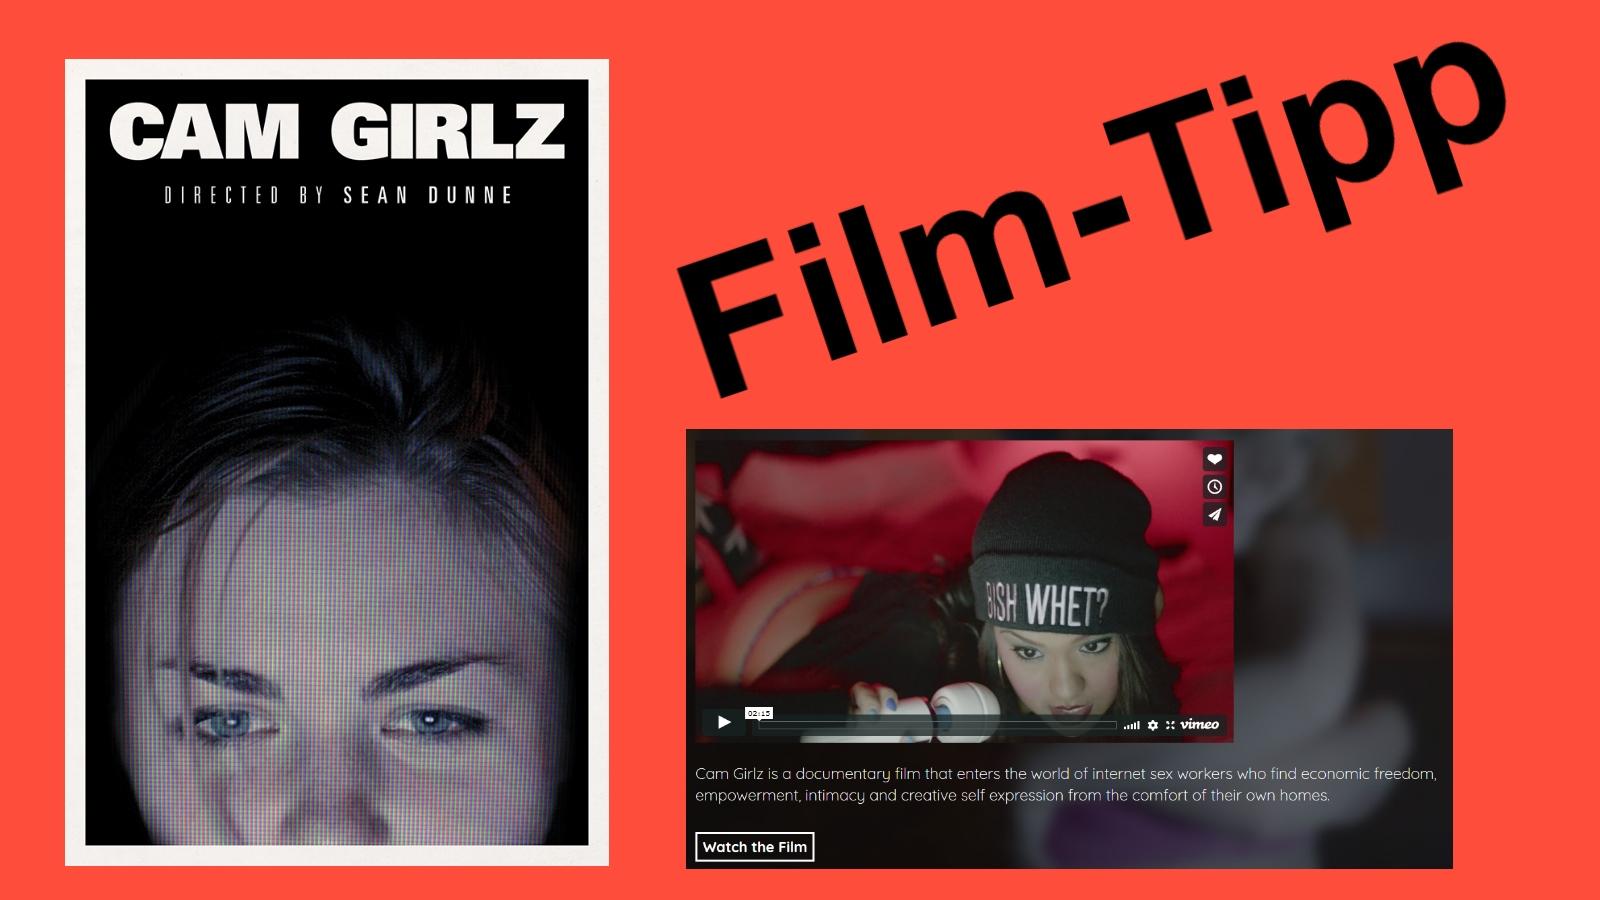 Film-Tipp Camgirlz